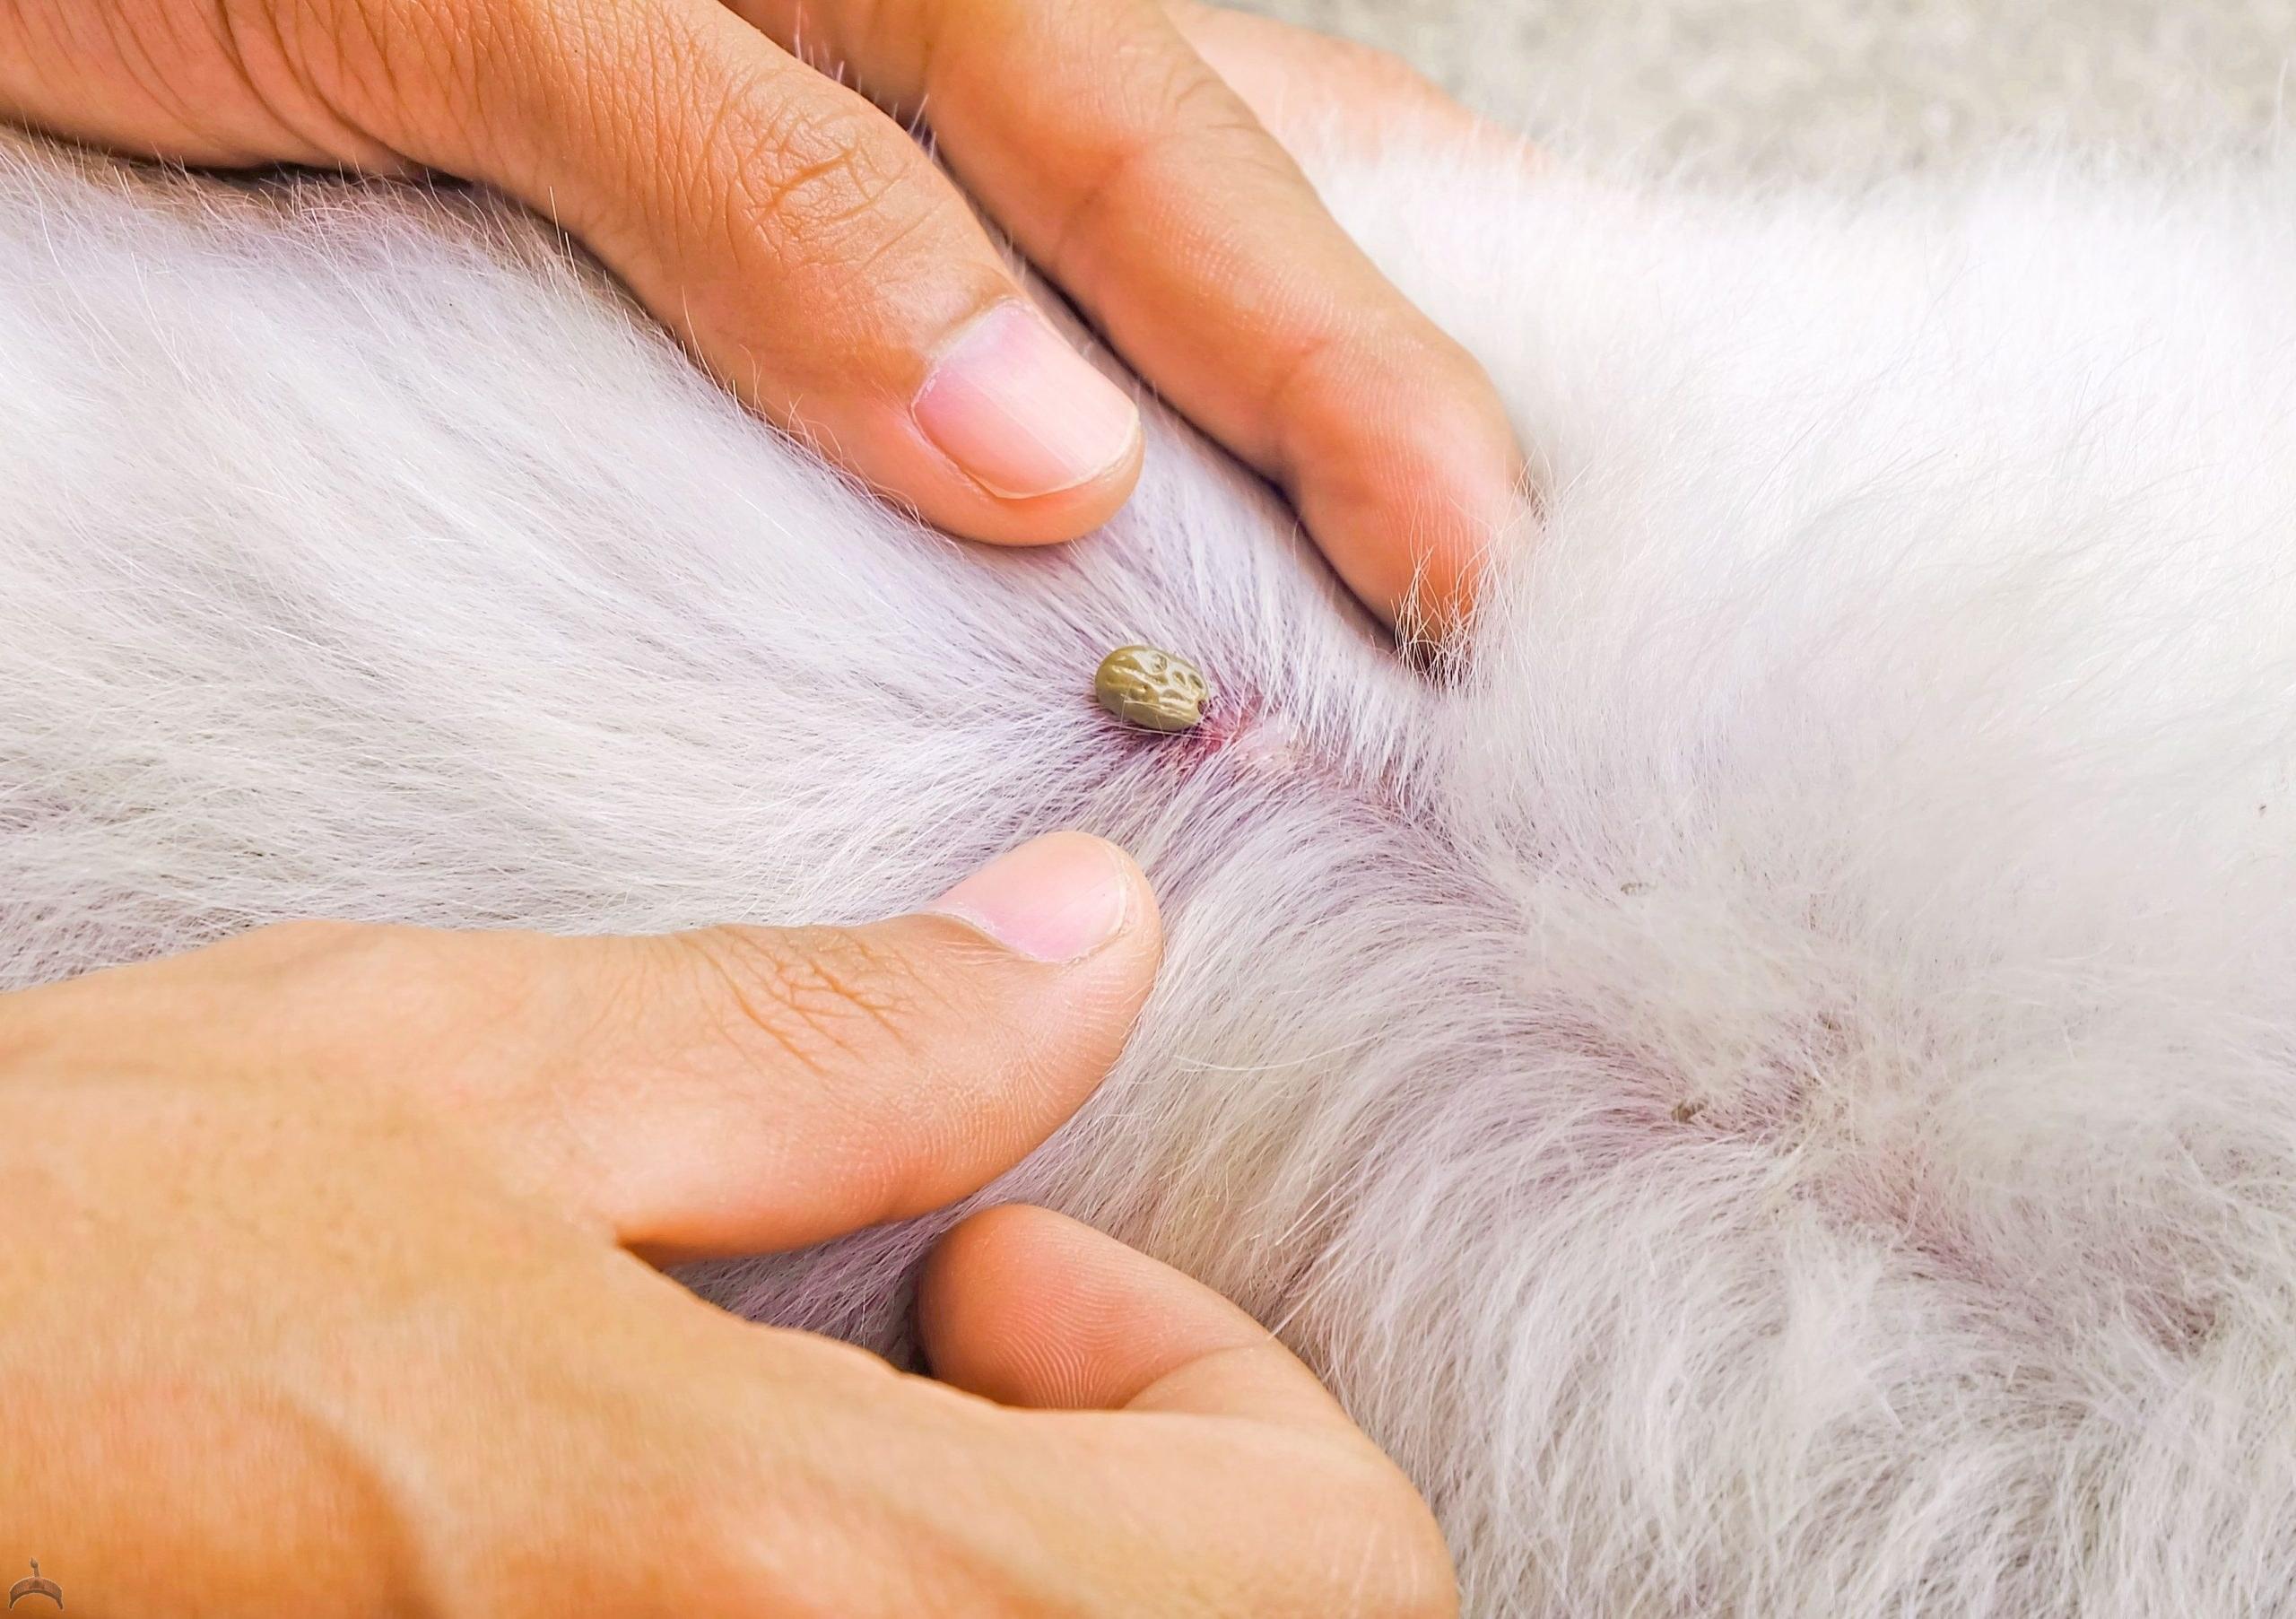 tick suck blood on dog back royalty free image